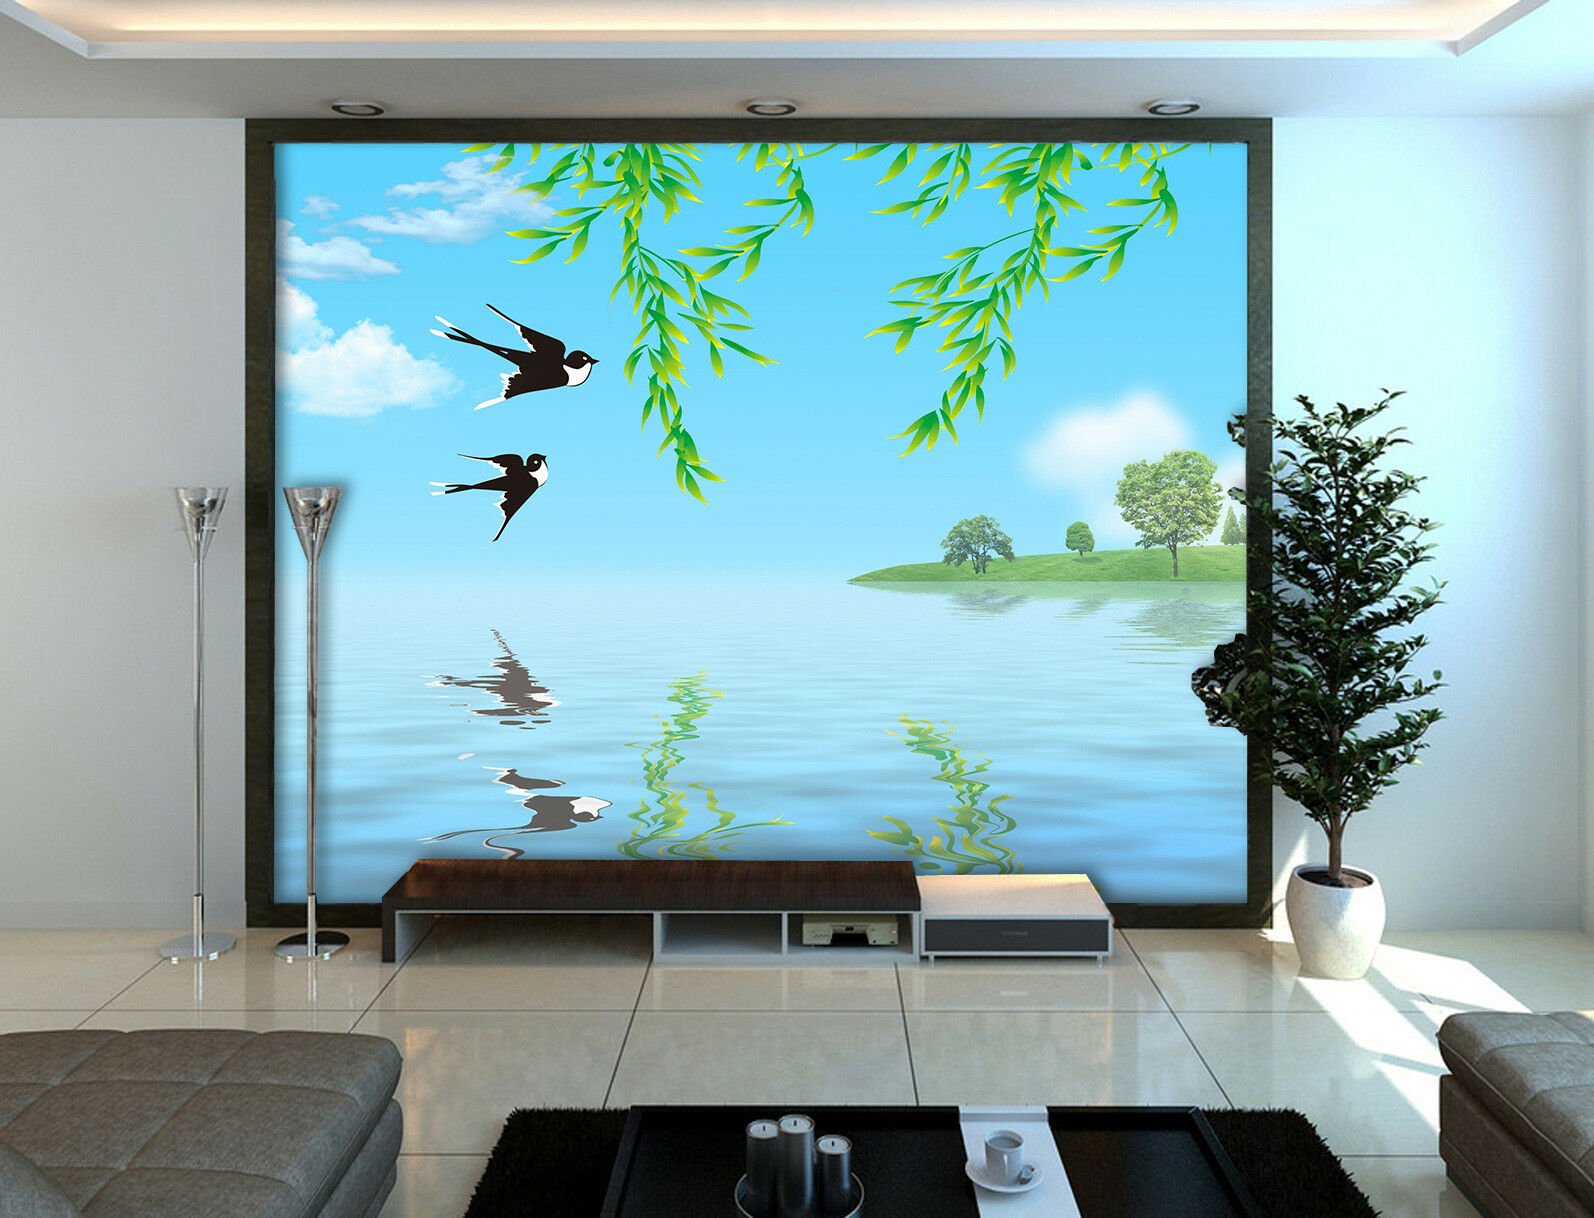 3D Willow Schwalben See See See 8983 Tapete Wandgemälde Tapeten Bild Familie DE Jenny | Spielen Sie Leidenschaft, spielen Sie die Ernte, spielen Sie die Welt  |  3a76fa